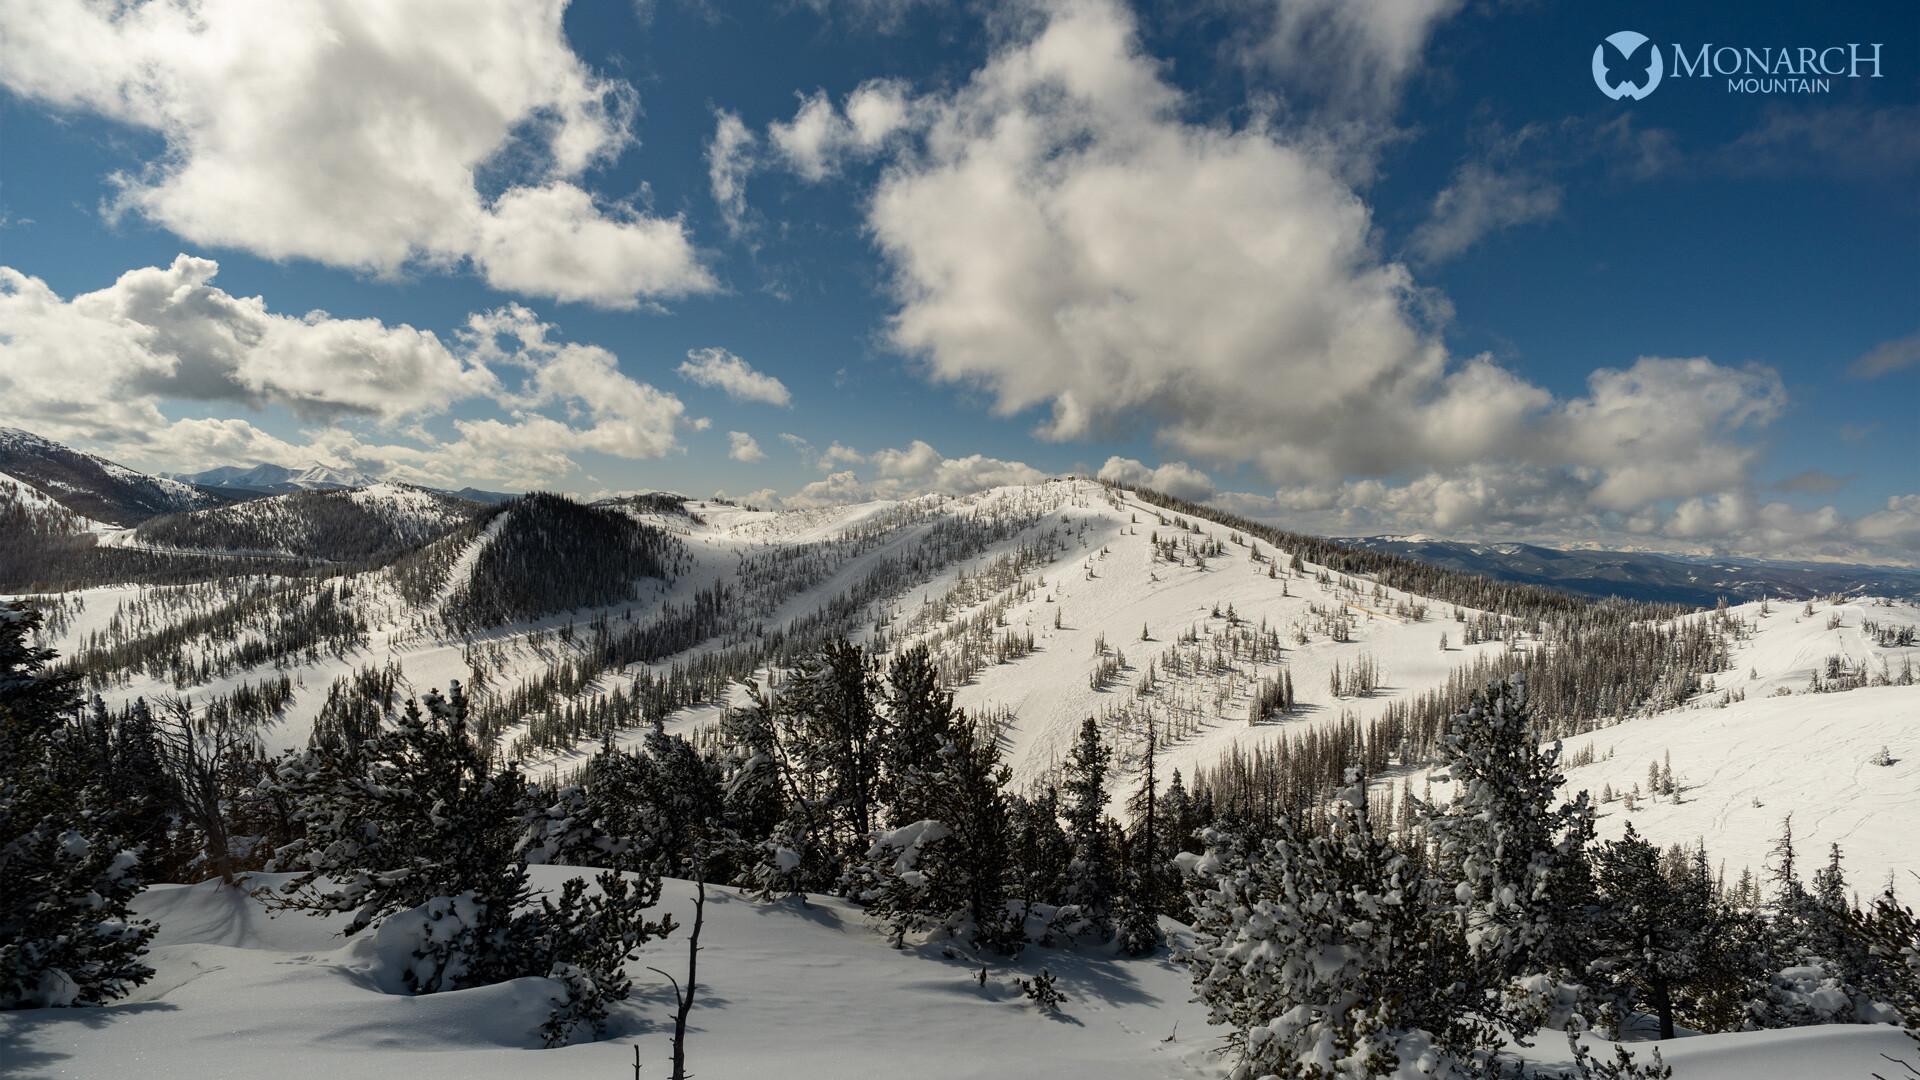 Monarch Mountain around 11 a.m. Tuesday.